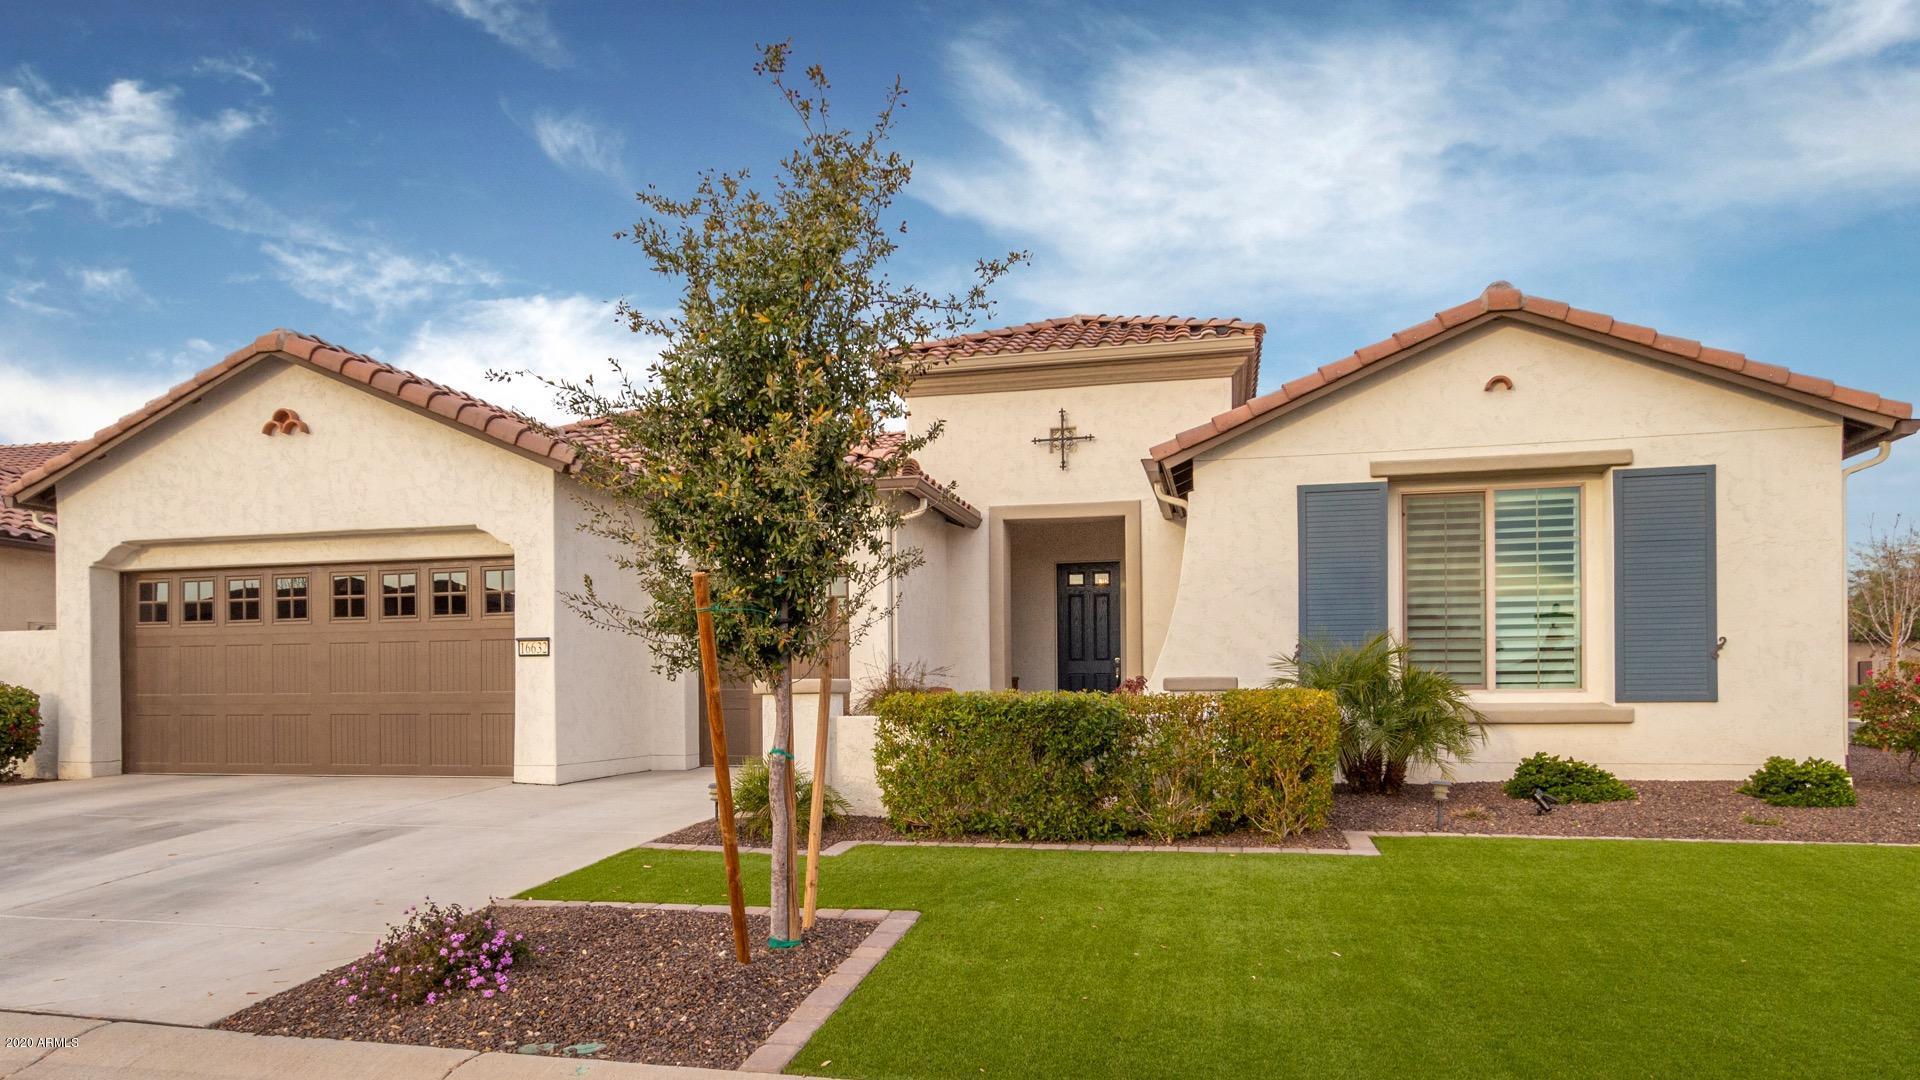 MLS 6026265 16632 W Alvarado Drive, Goodyear, AZ 85395 Goodyear AZ Luxury